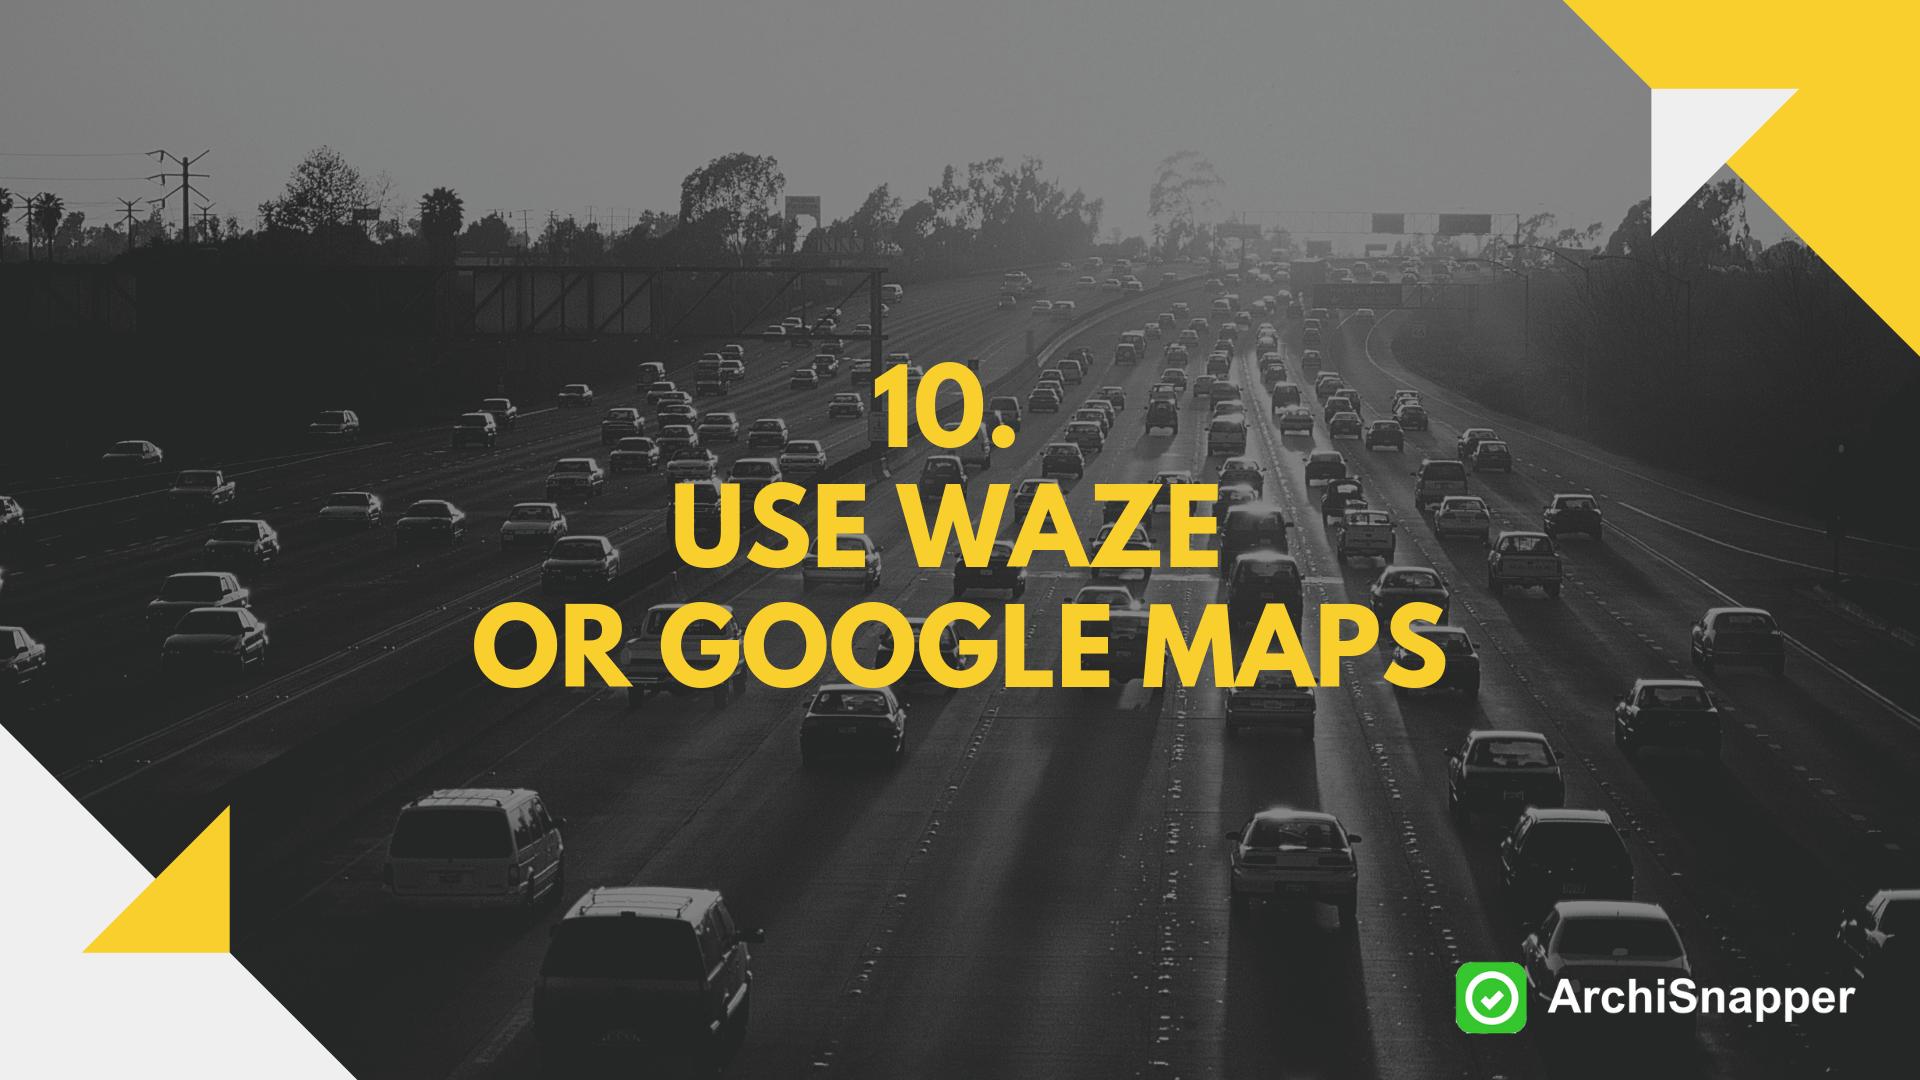 use waze or google maps via archisnapper